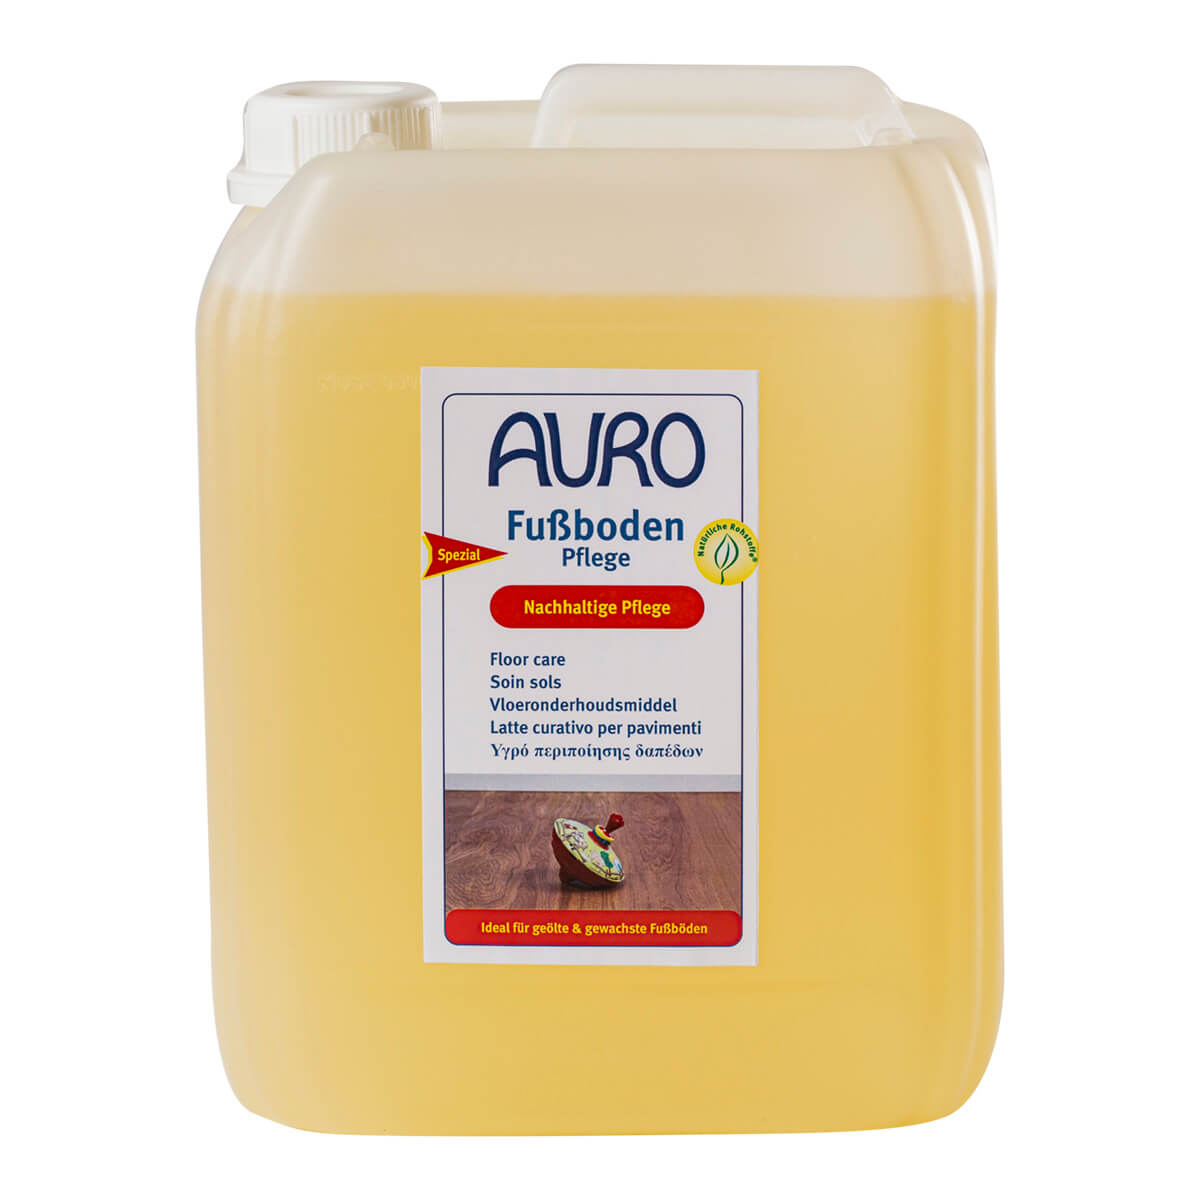 AURO Fußboden-Pflege Nr. 437 5,00L